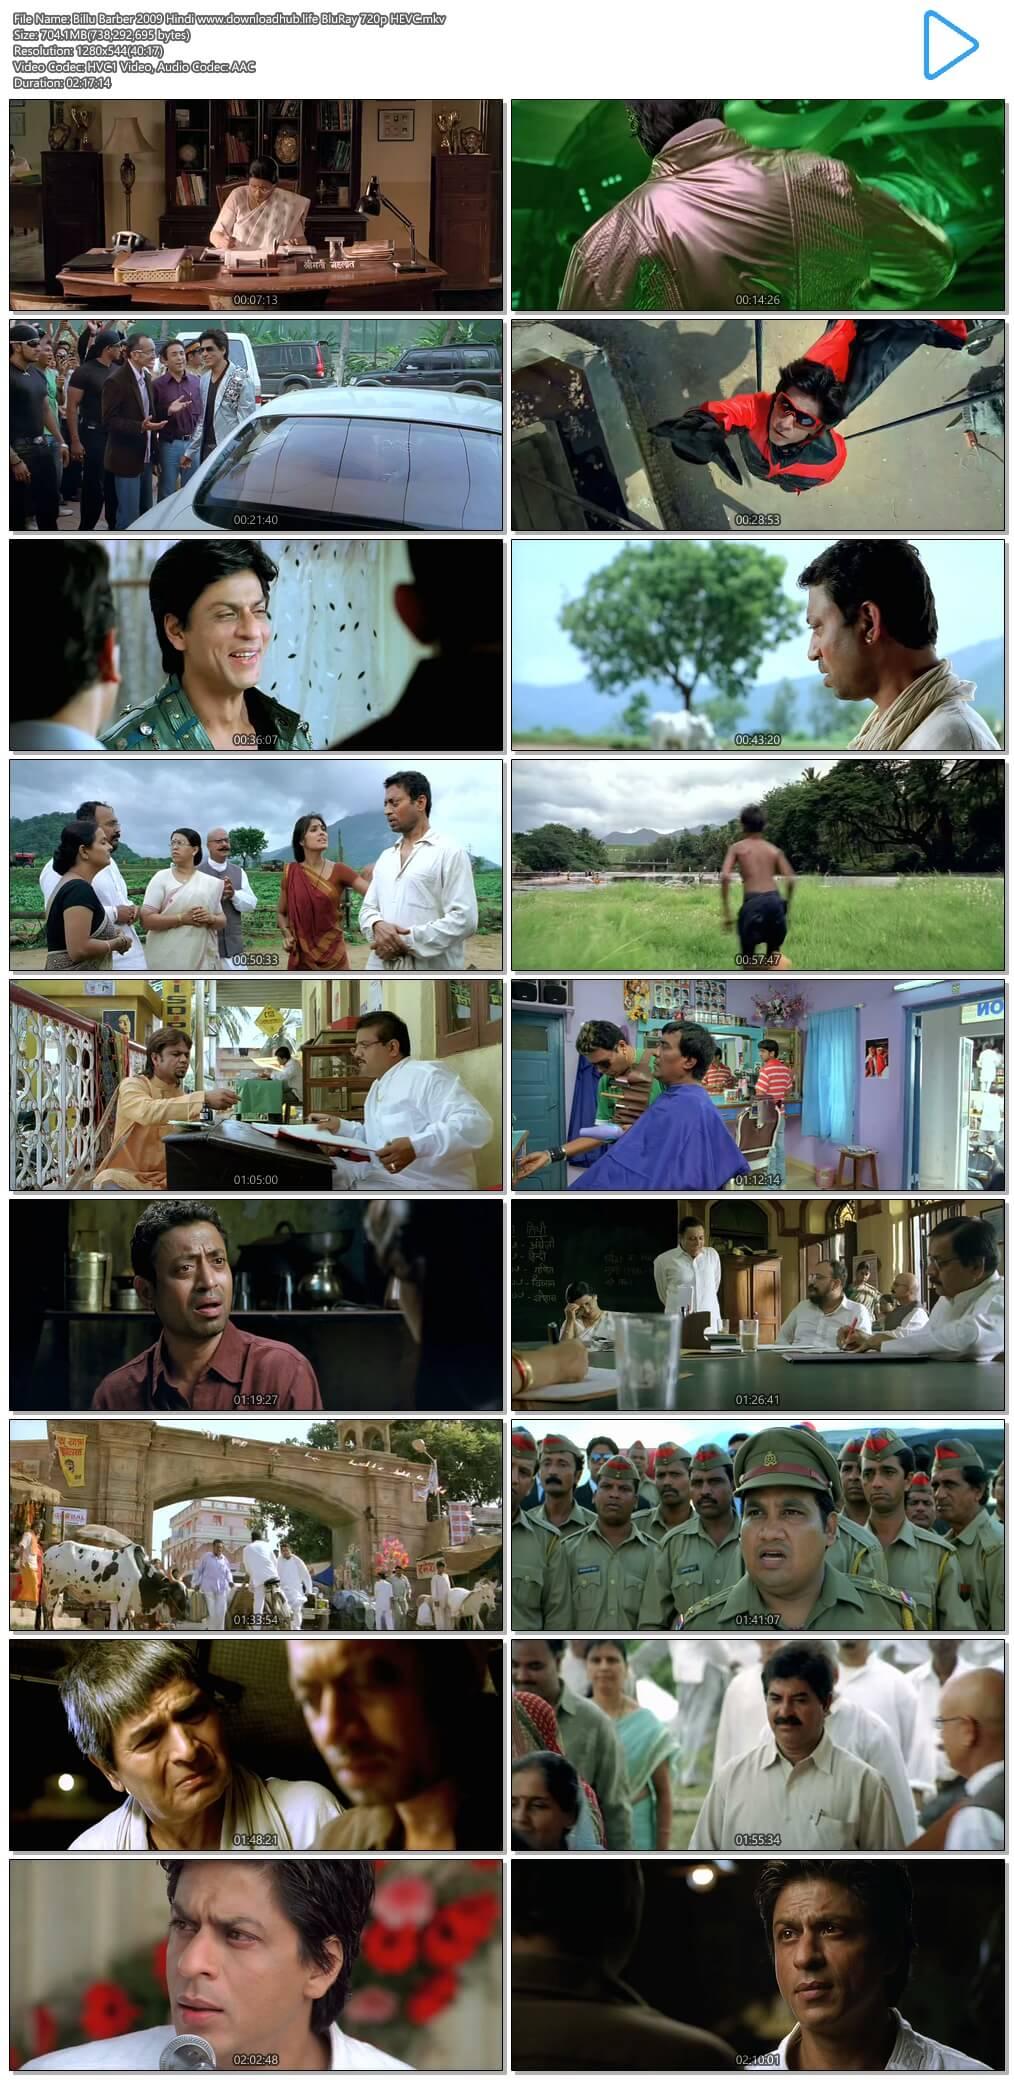 Billu Barber 2009 Hindi 700MB BluRay 720p HEVC